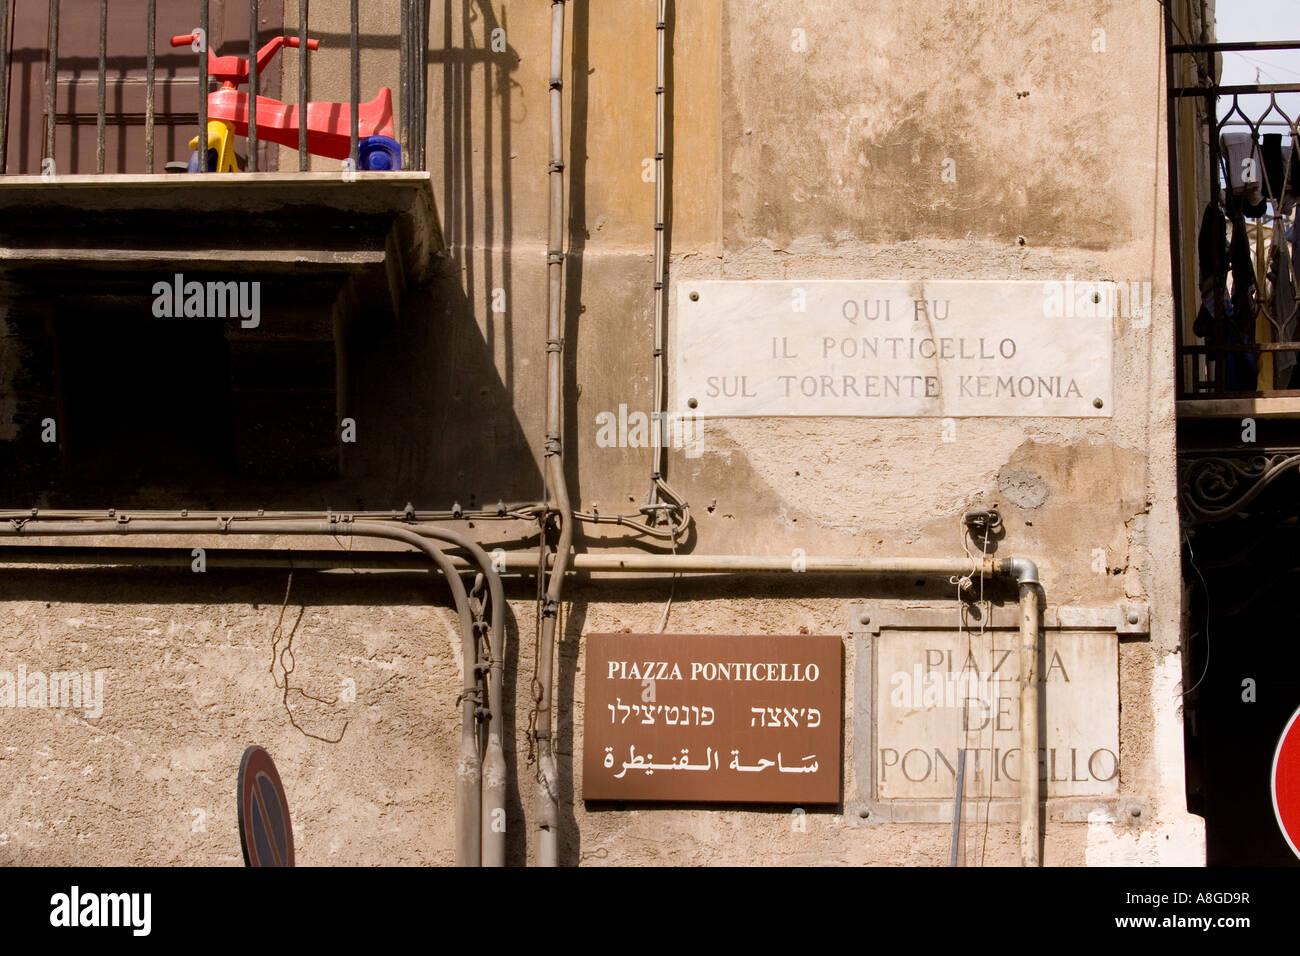 Italian Arabic and Hebrew language street sign Palermo Sicily Italy - Stock Image